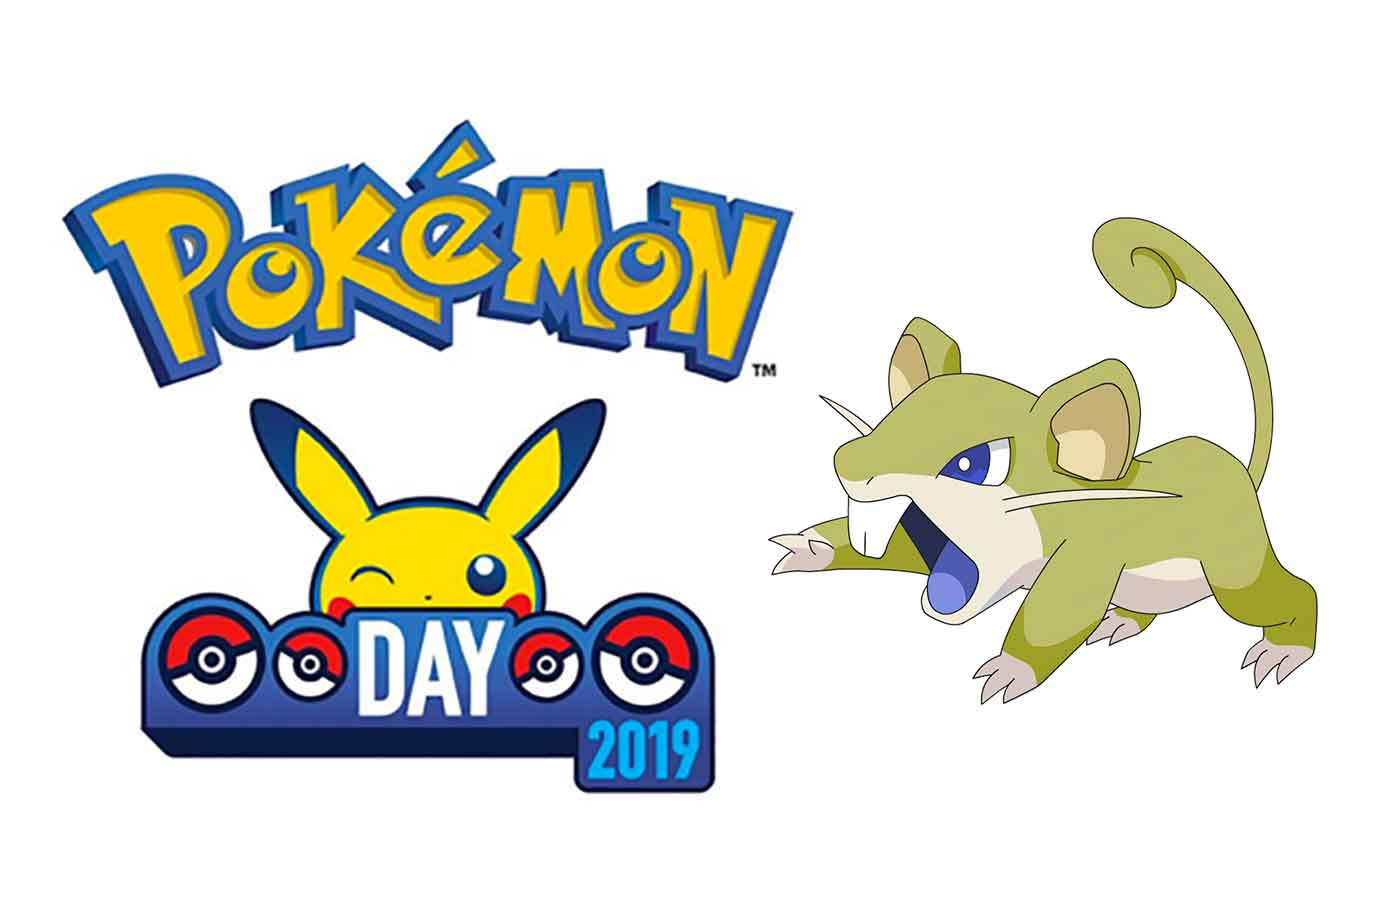 Pokemon Go anniversary event to get Pidgey and Rattata shiny and